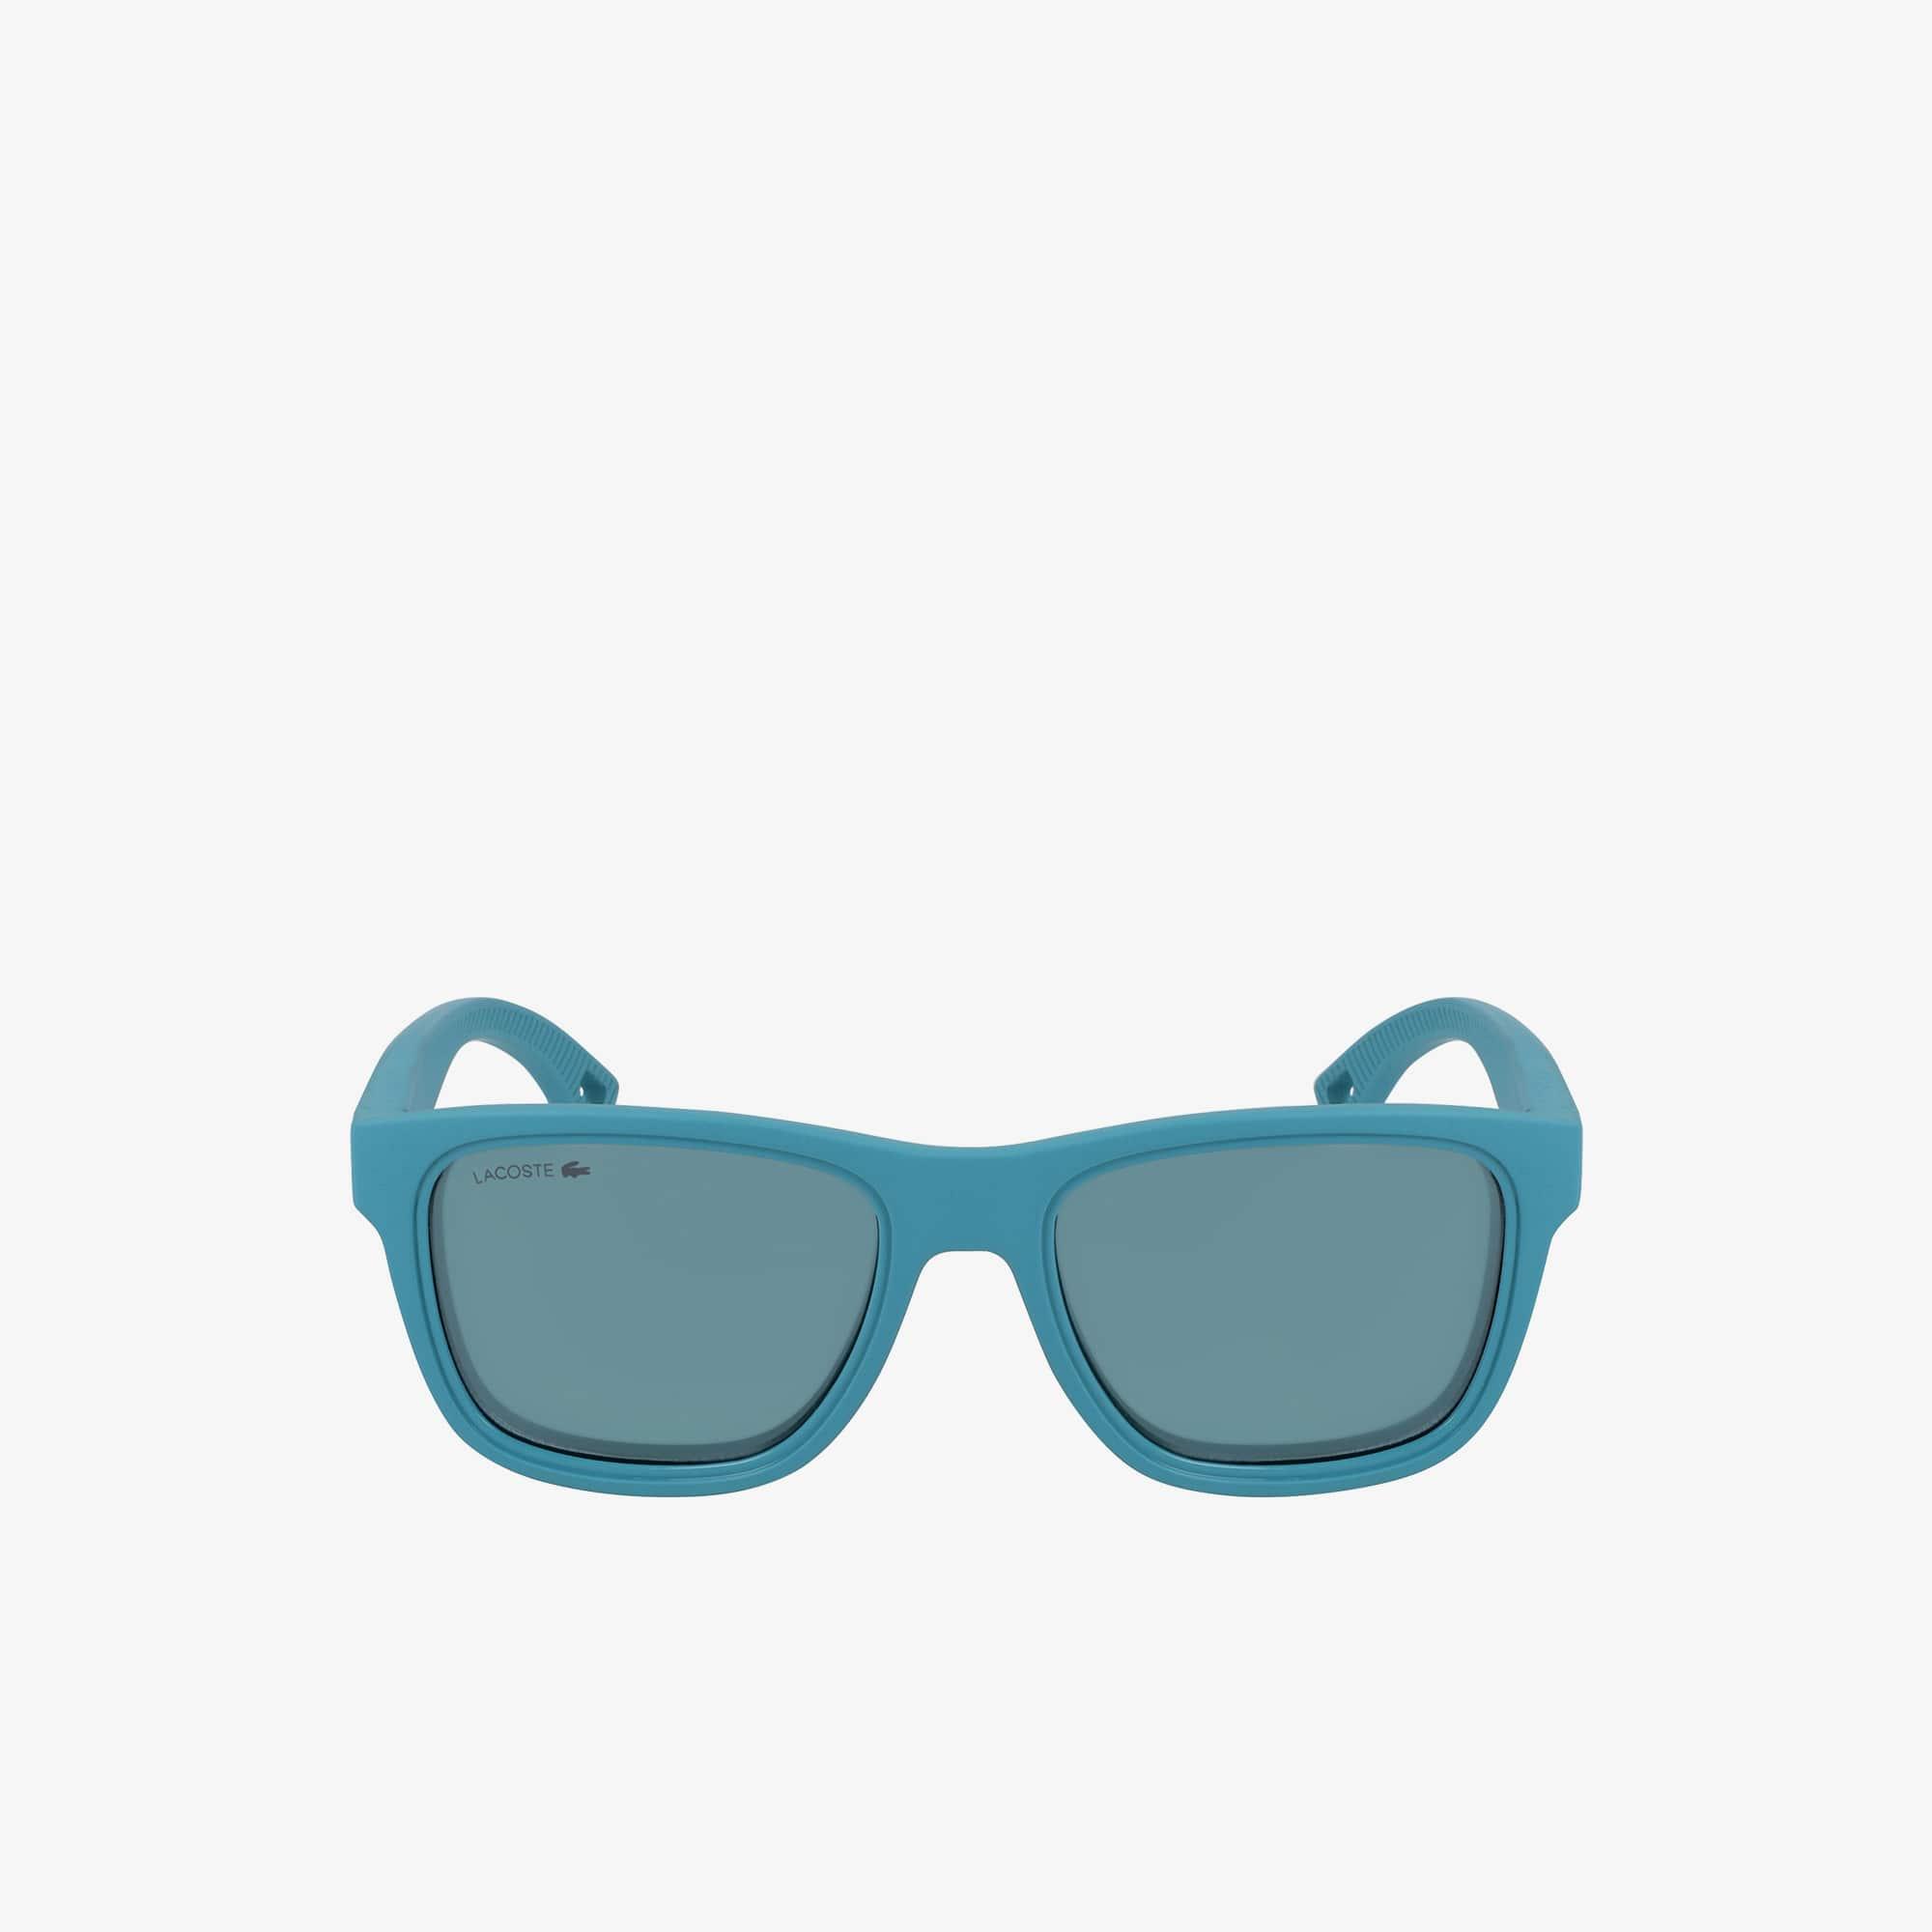 Kids' Rectangle Plastic Floatable Sunglasses